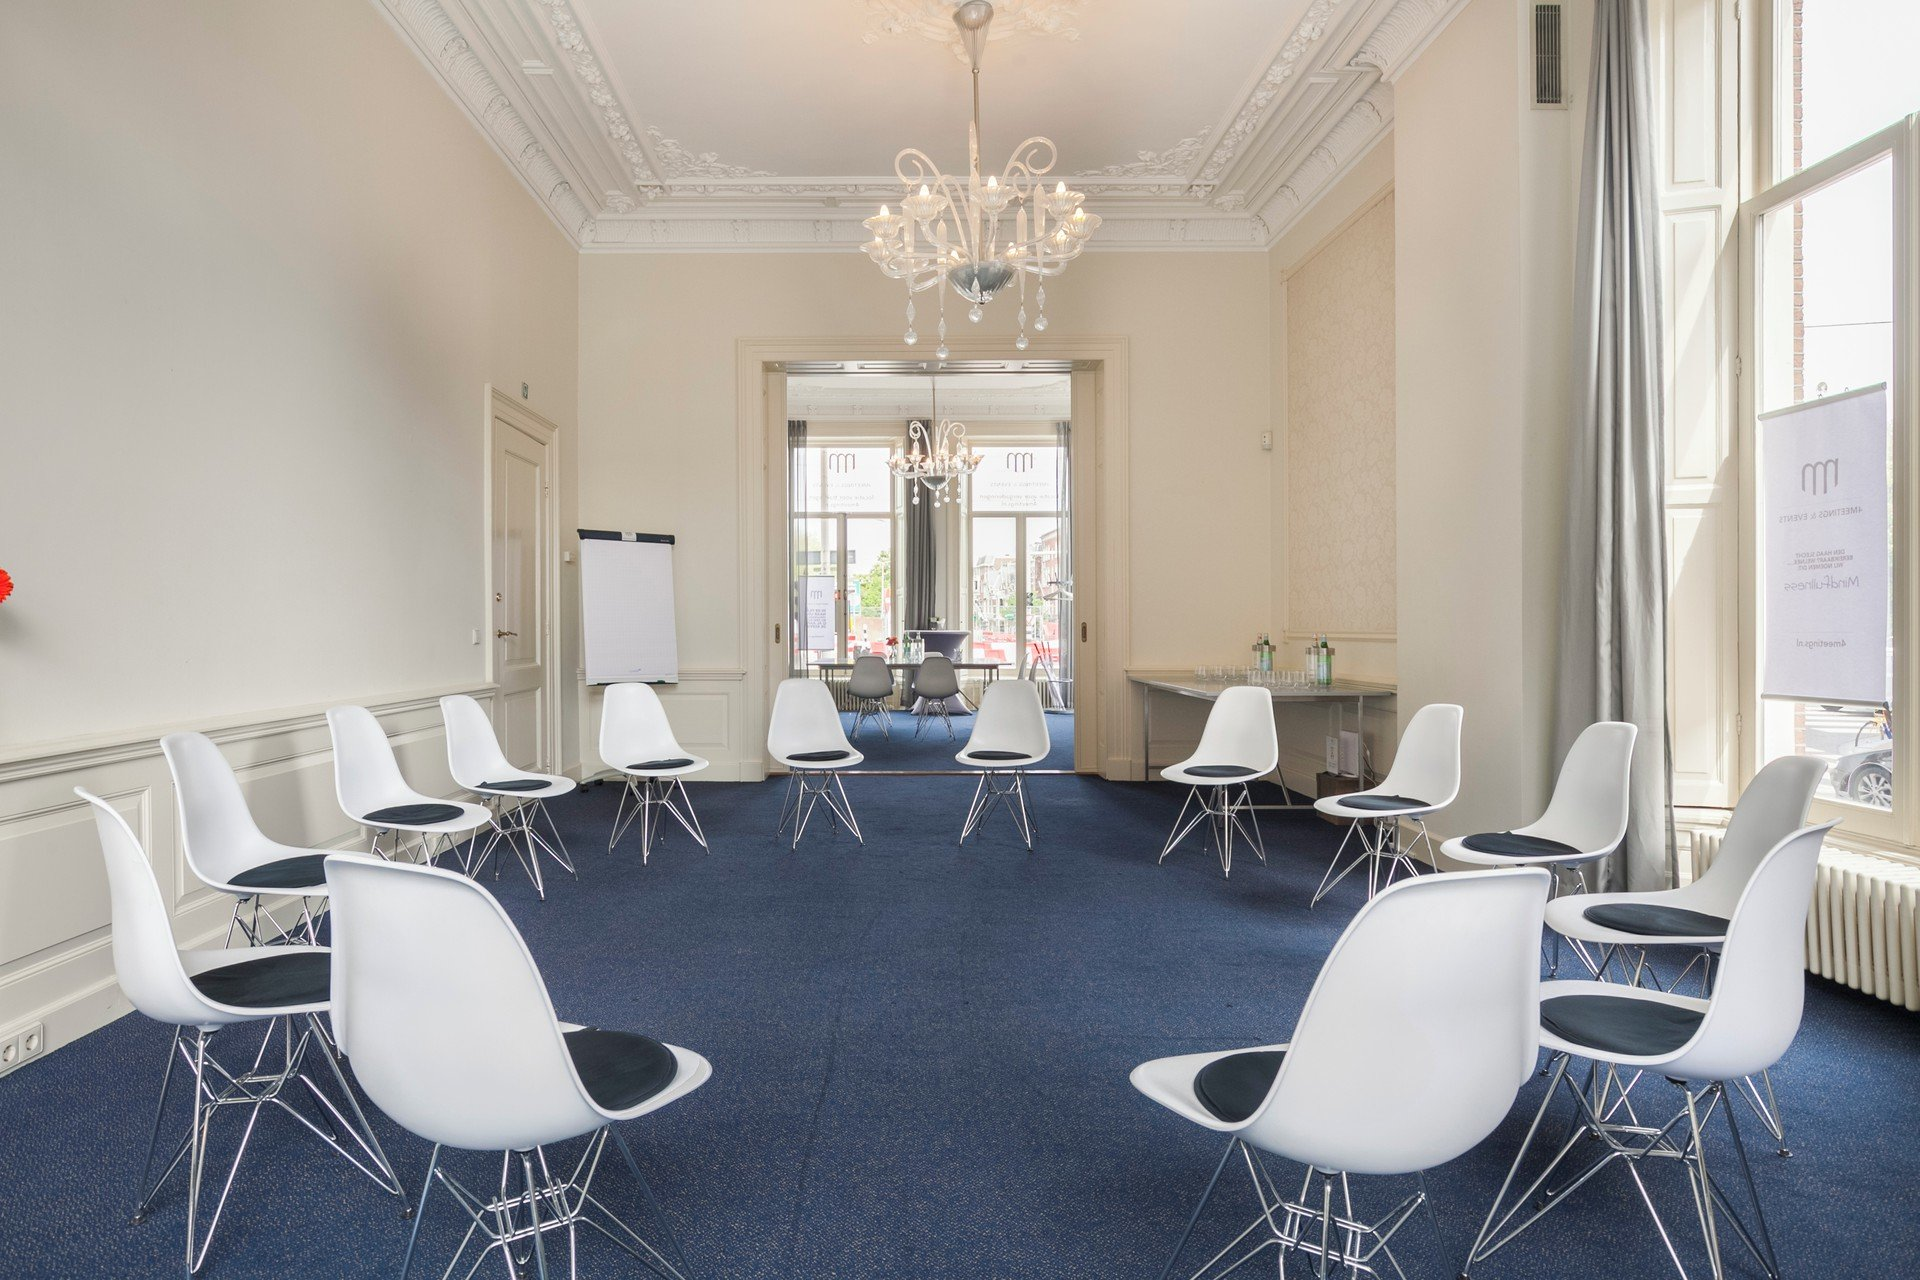 Den Haag conference rooms Meetingraum House Koninginnegracht image 4